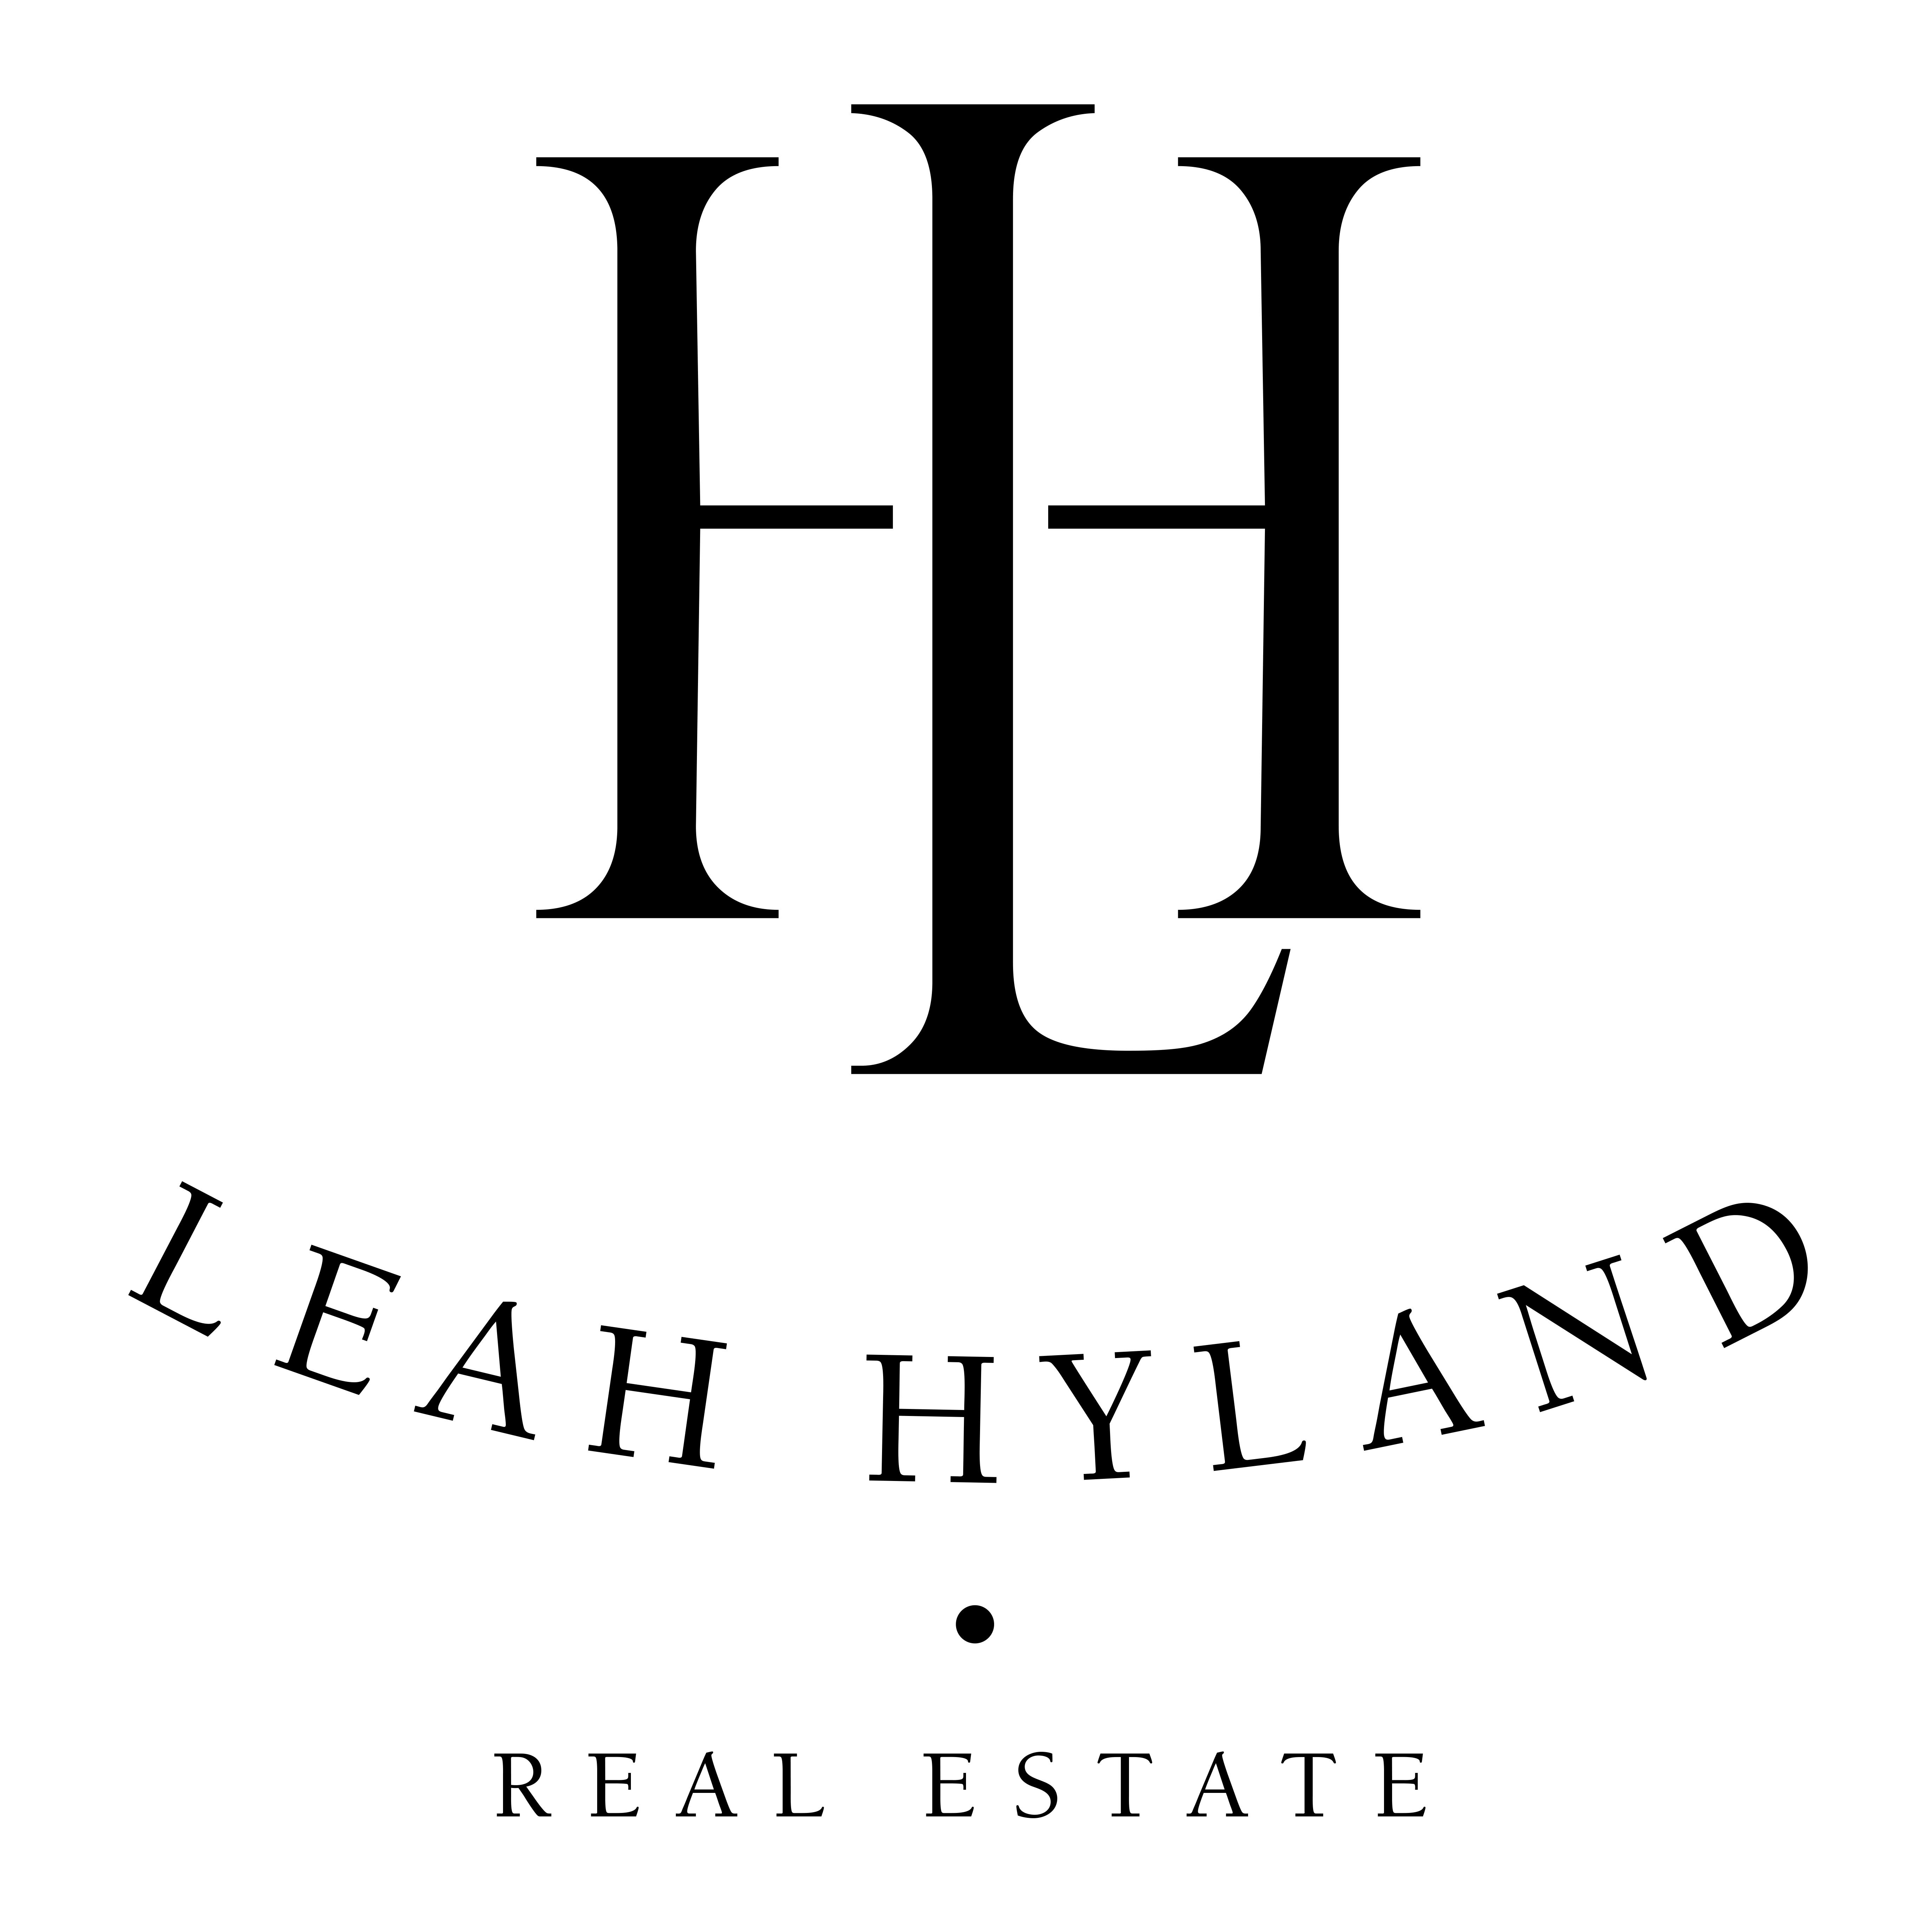 Leah Hyland, Real Estate, Business, Logo